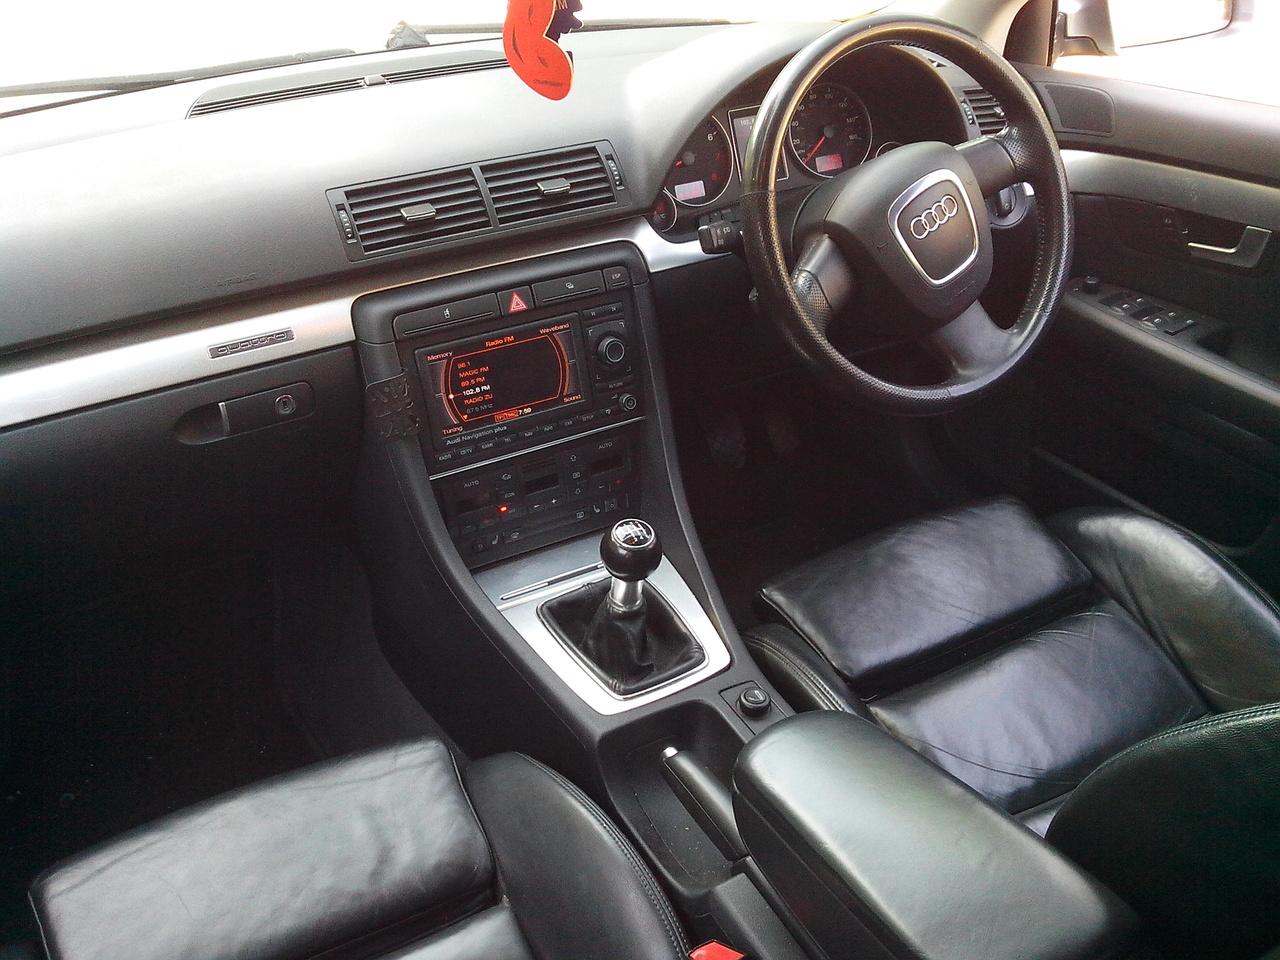 Audi A4 20 Tfsi Quattro S Line 2005 4225919 Radio